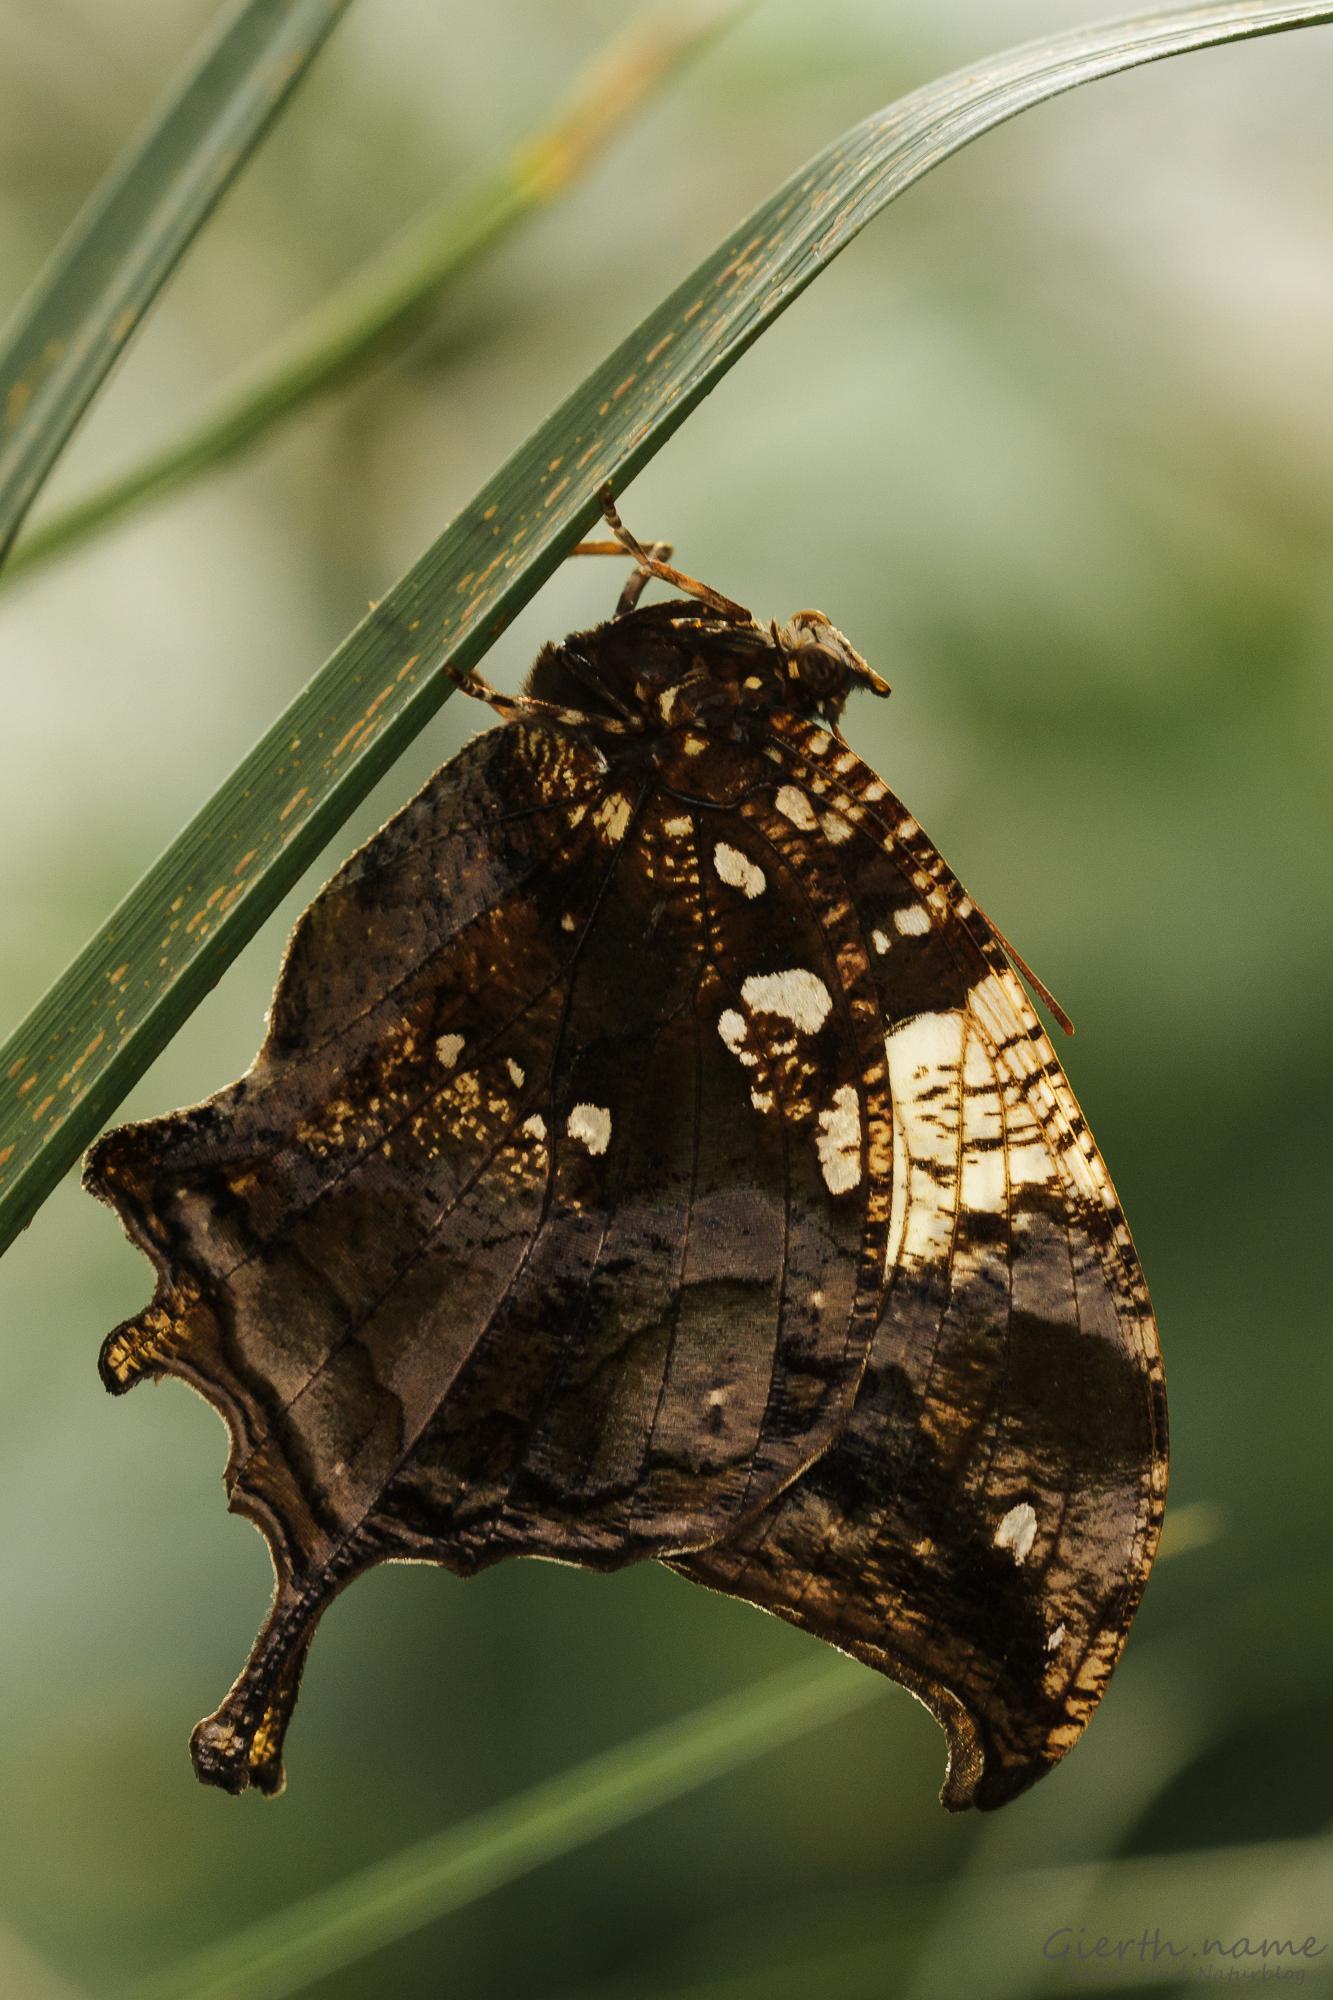 Hypna clytemnestra, Marbled Leafwing